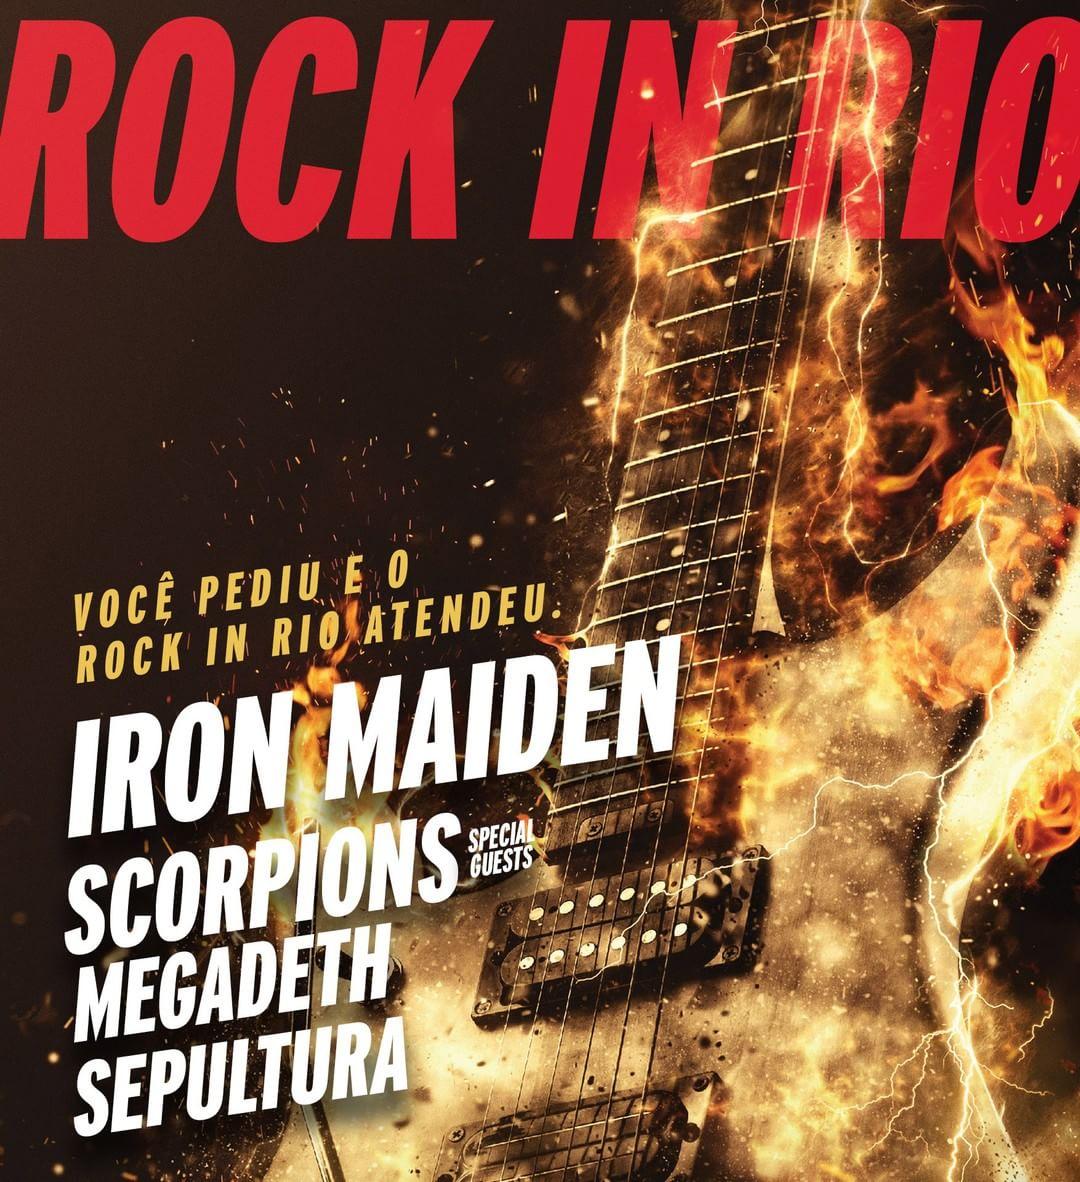 Rock in Rio. Foto: Reprodução/Instagram (@IronMaiden)